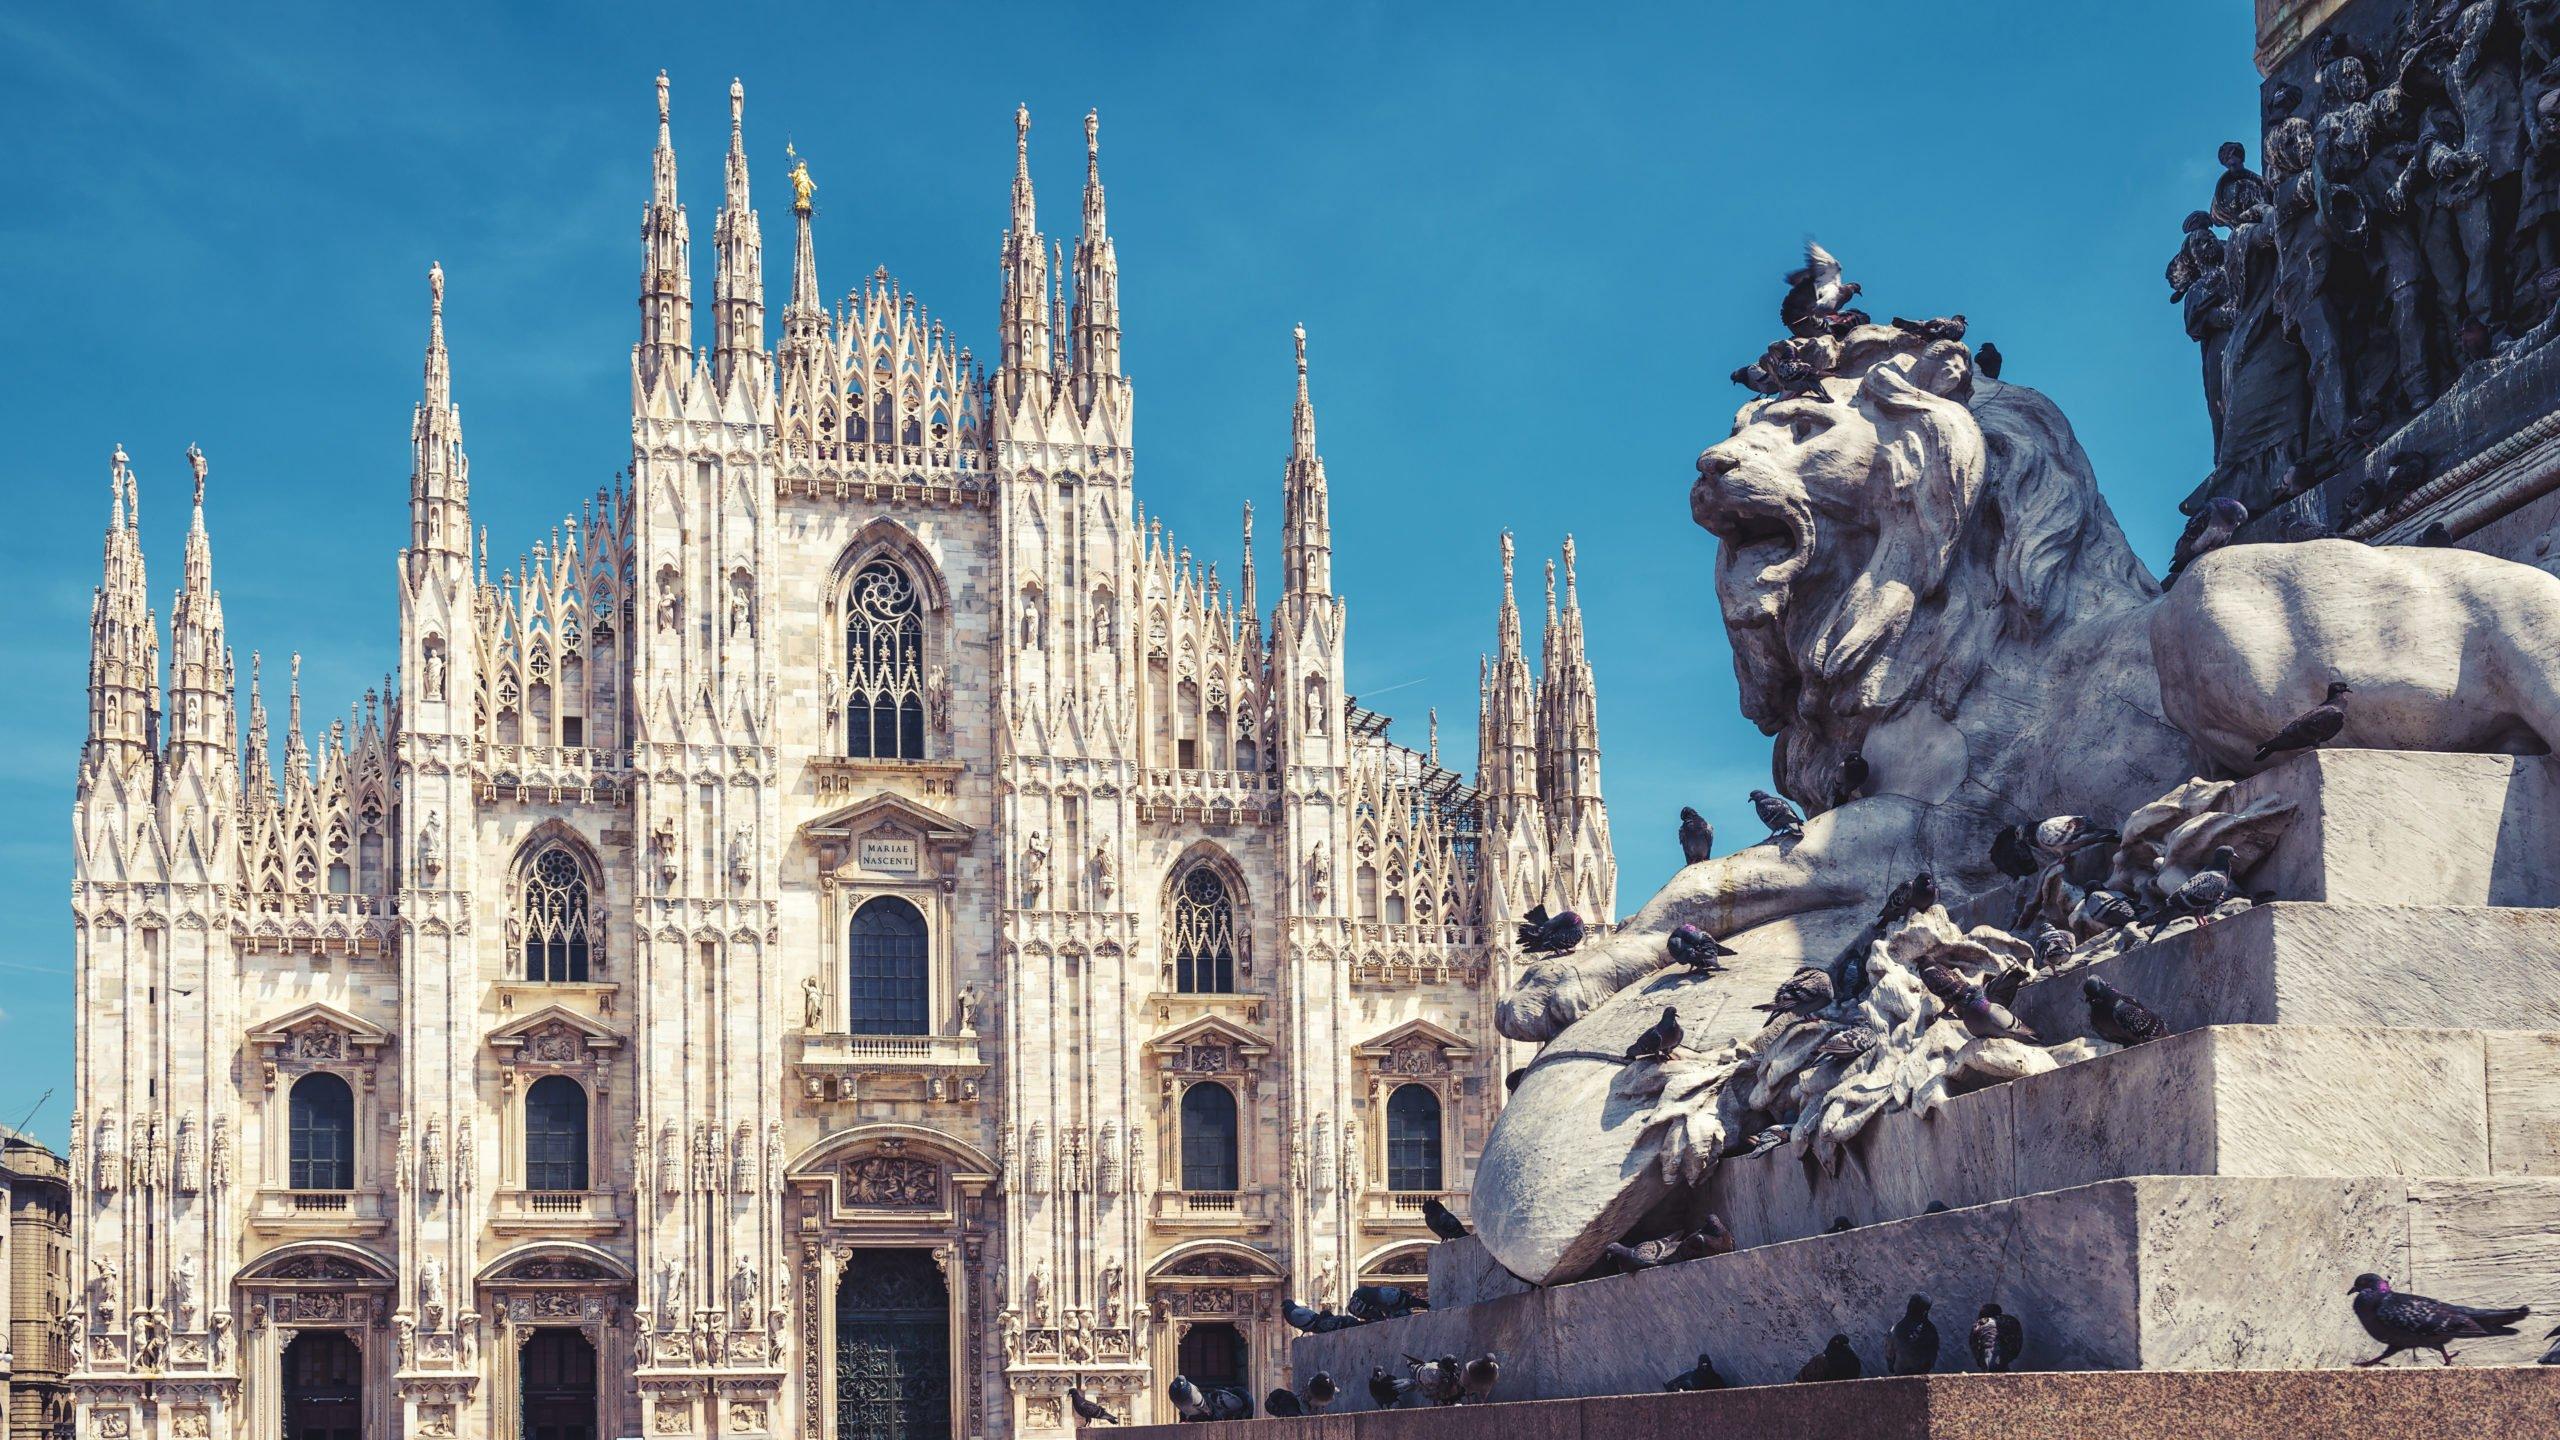 Discover The Duomo Of Milan On The Milan Dome And Sforza Castle Half Day Tour